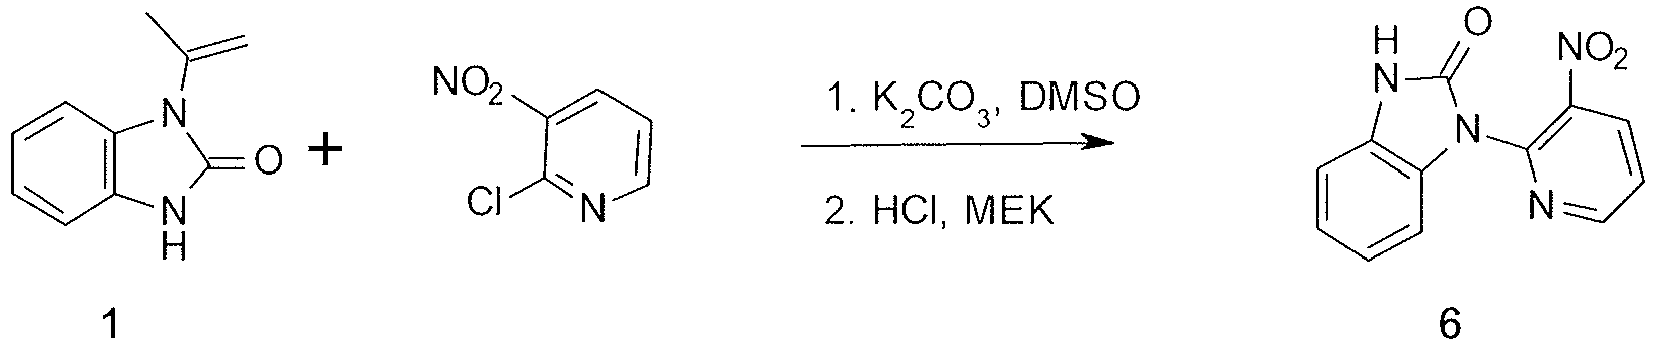 Figure imgb0722